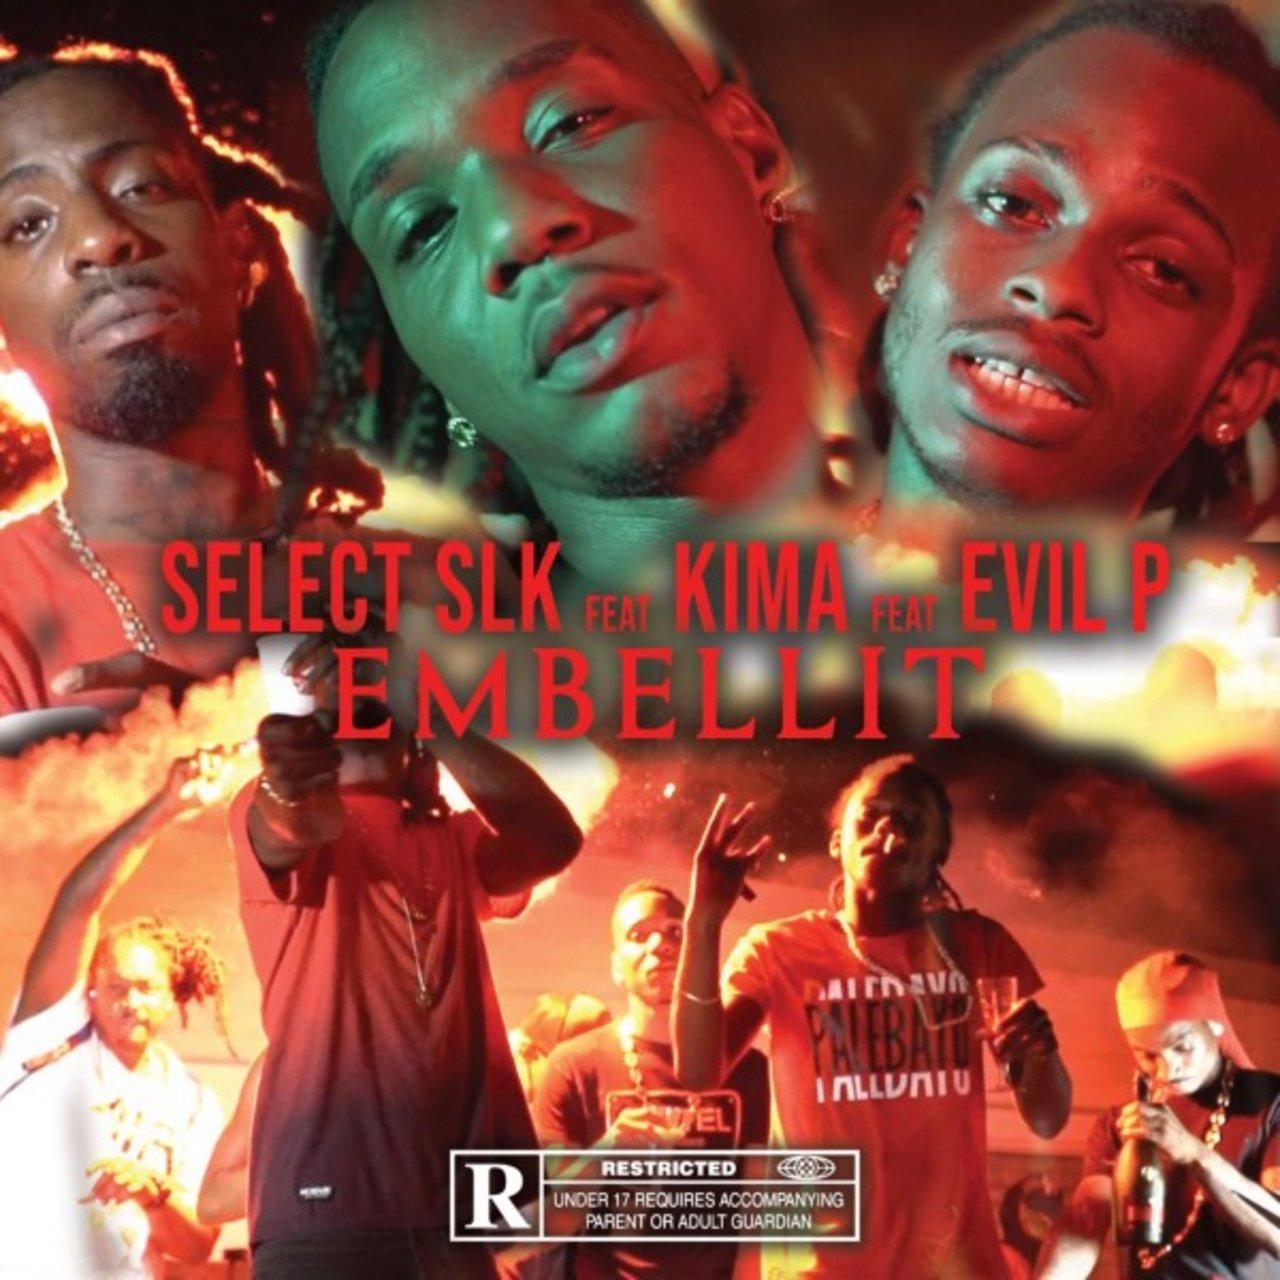 Select SLK - Embellit (ft. Kima and Evil P) (Cover)